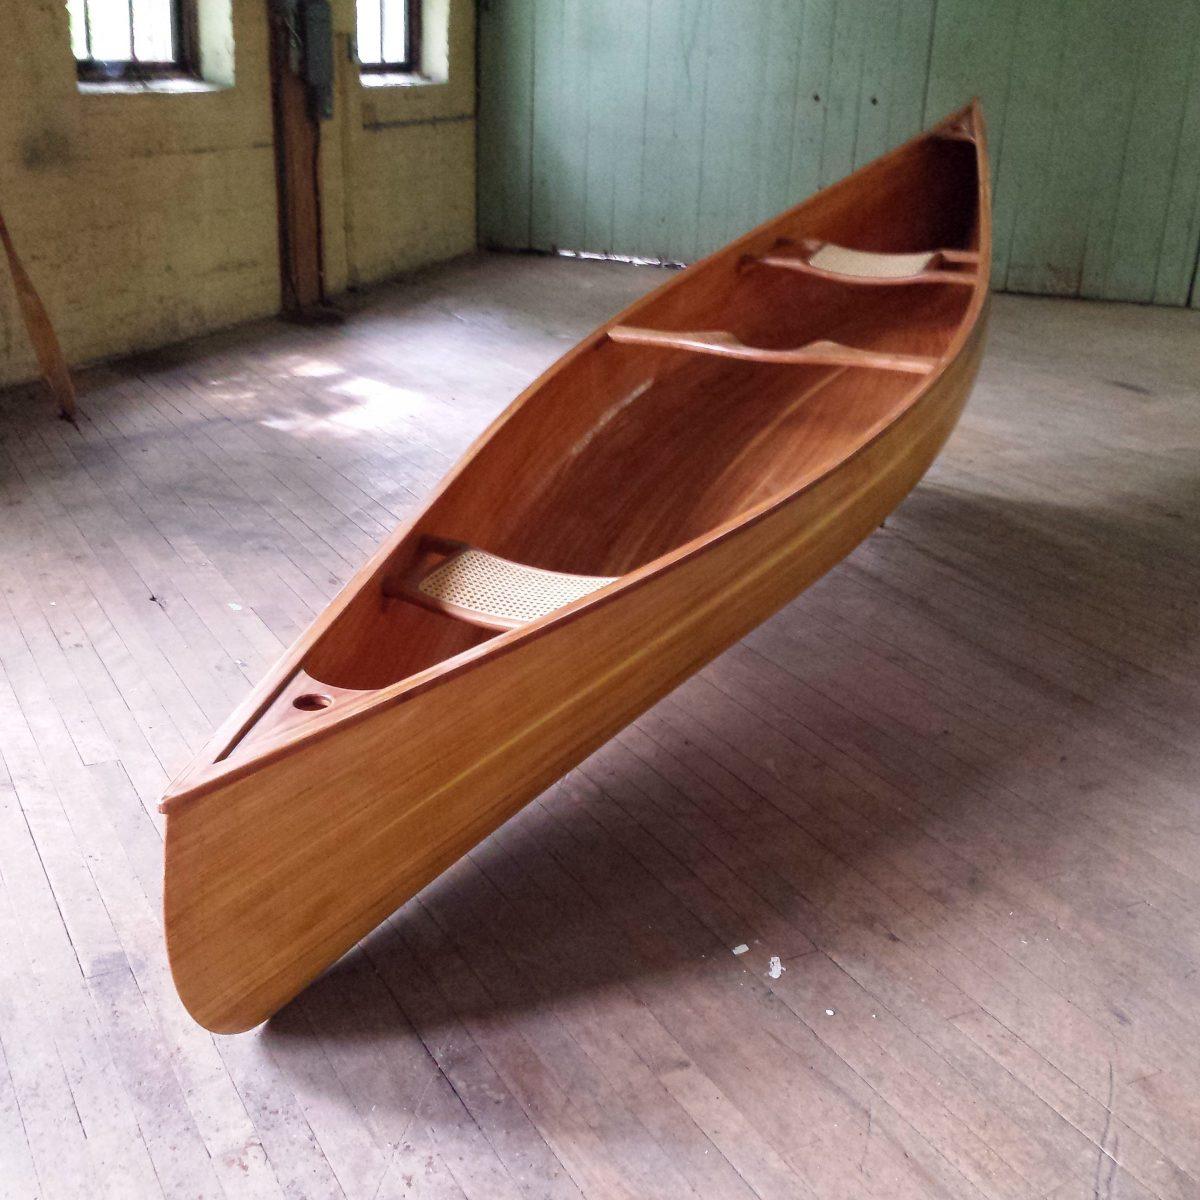 Cedar Strip Canoe from Ashes Still Water Boats